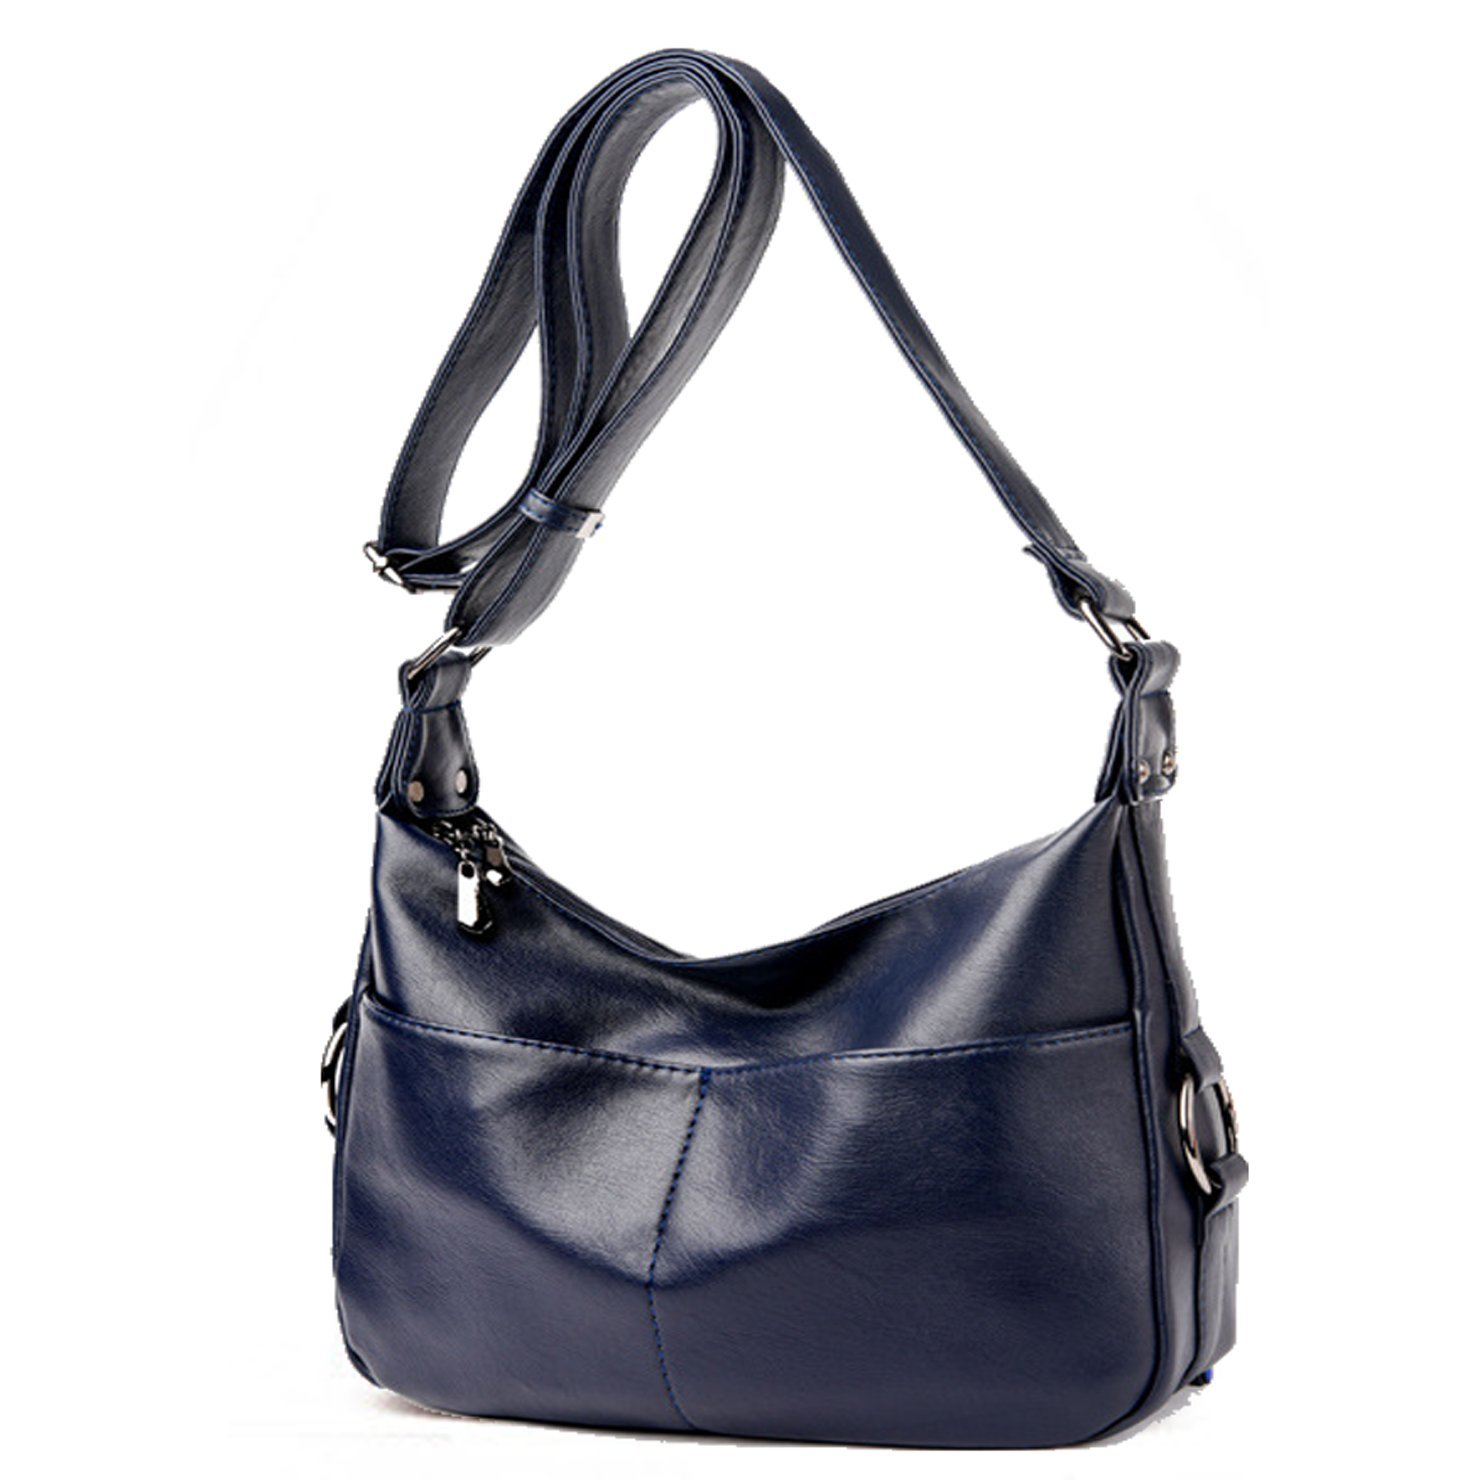 bf4cc7d492 Amazon.com  Lustear Ladies Soft Leather Shoulder Bags Hobo Style Bag (Navy  Blue)  Shoes